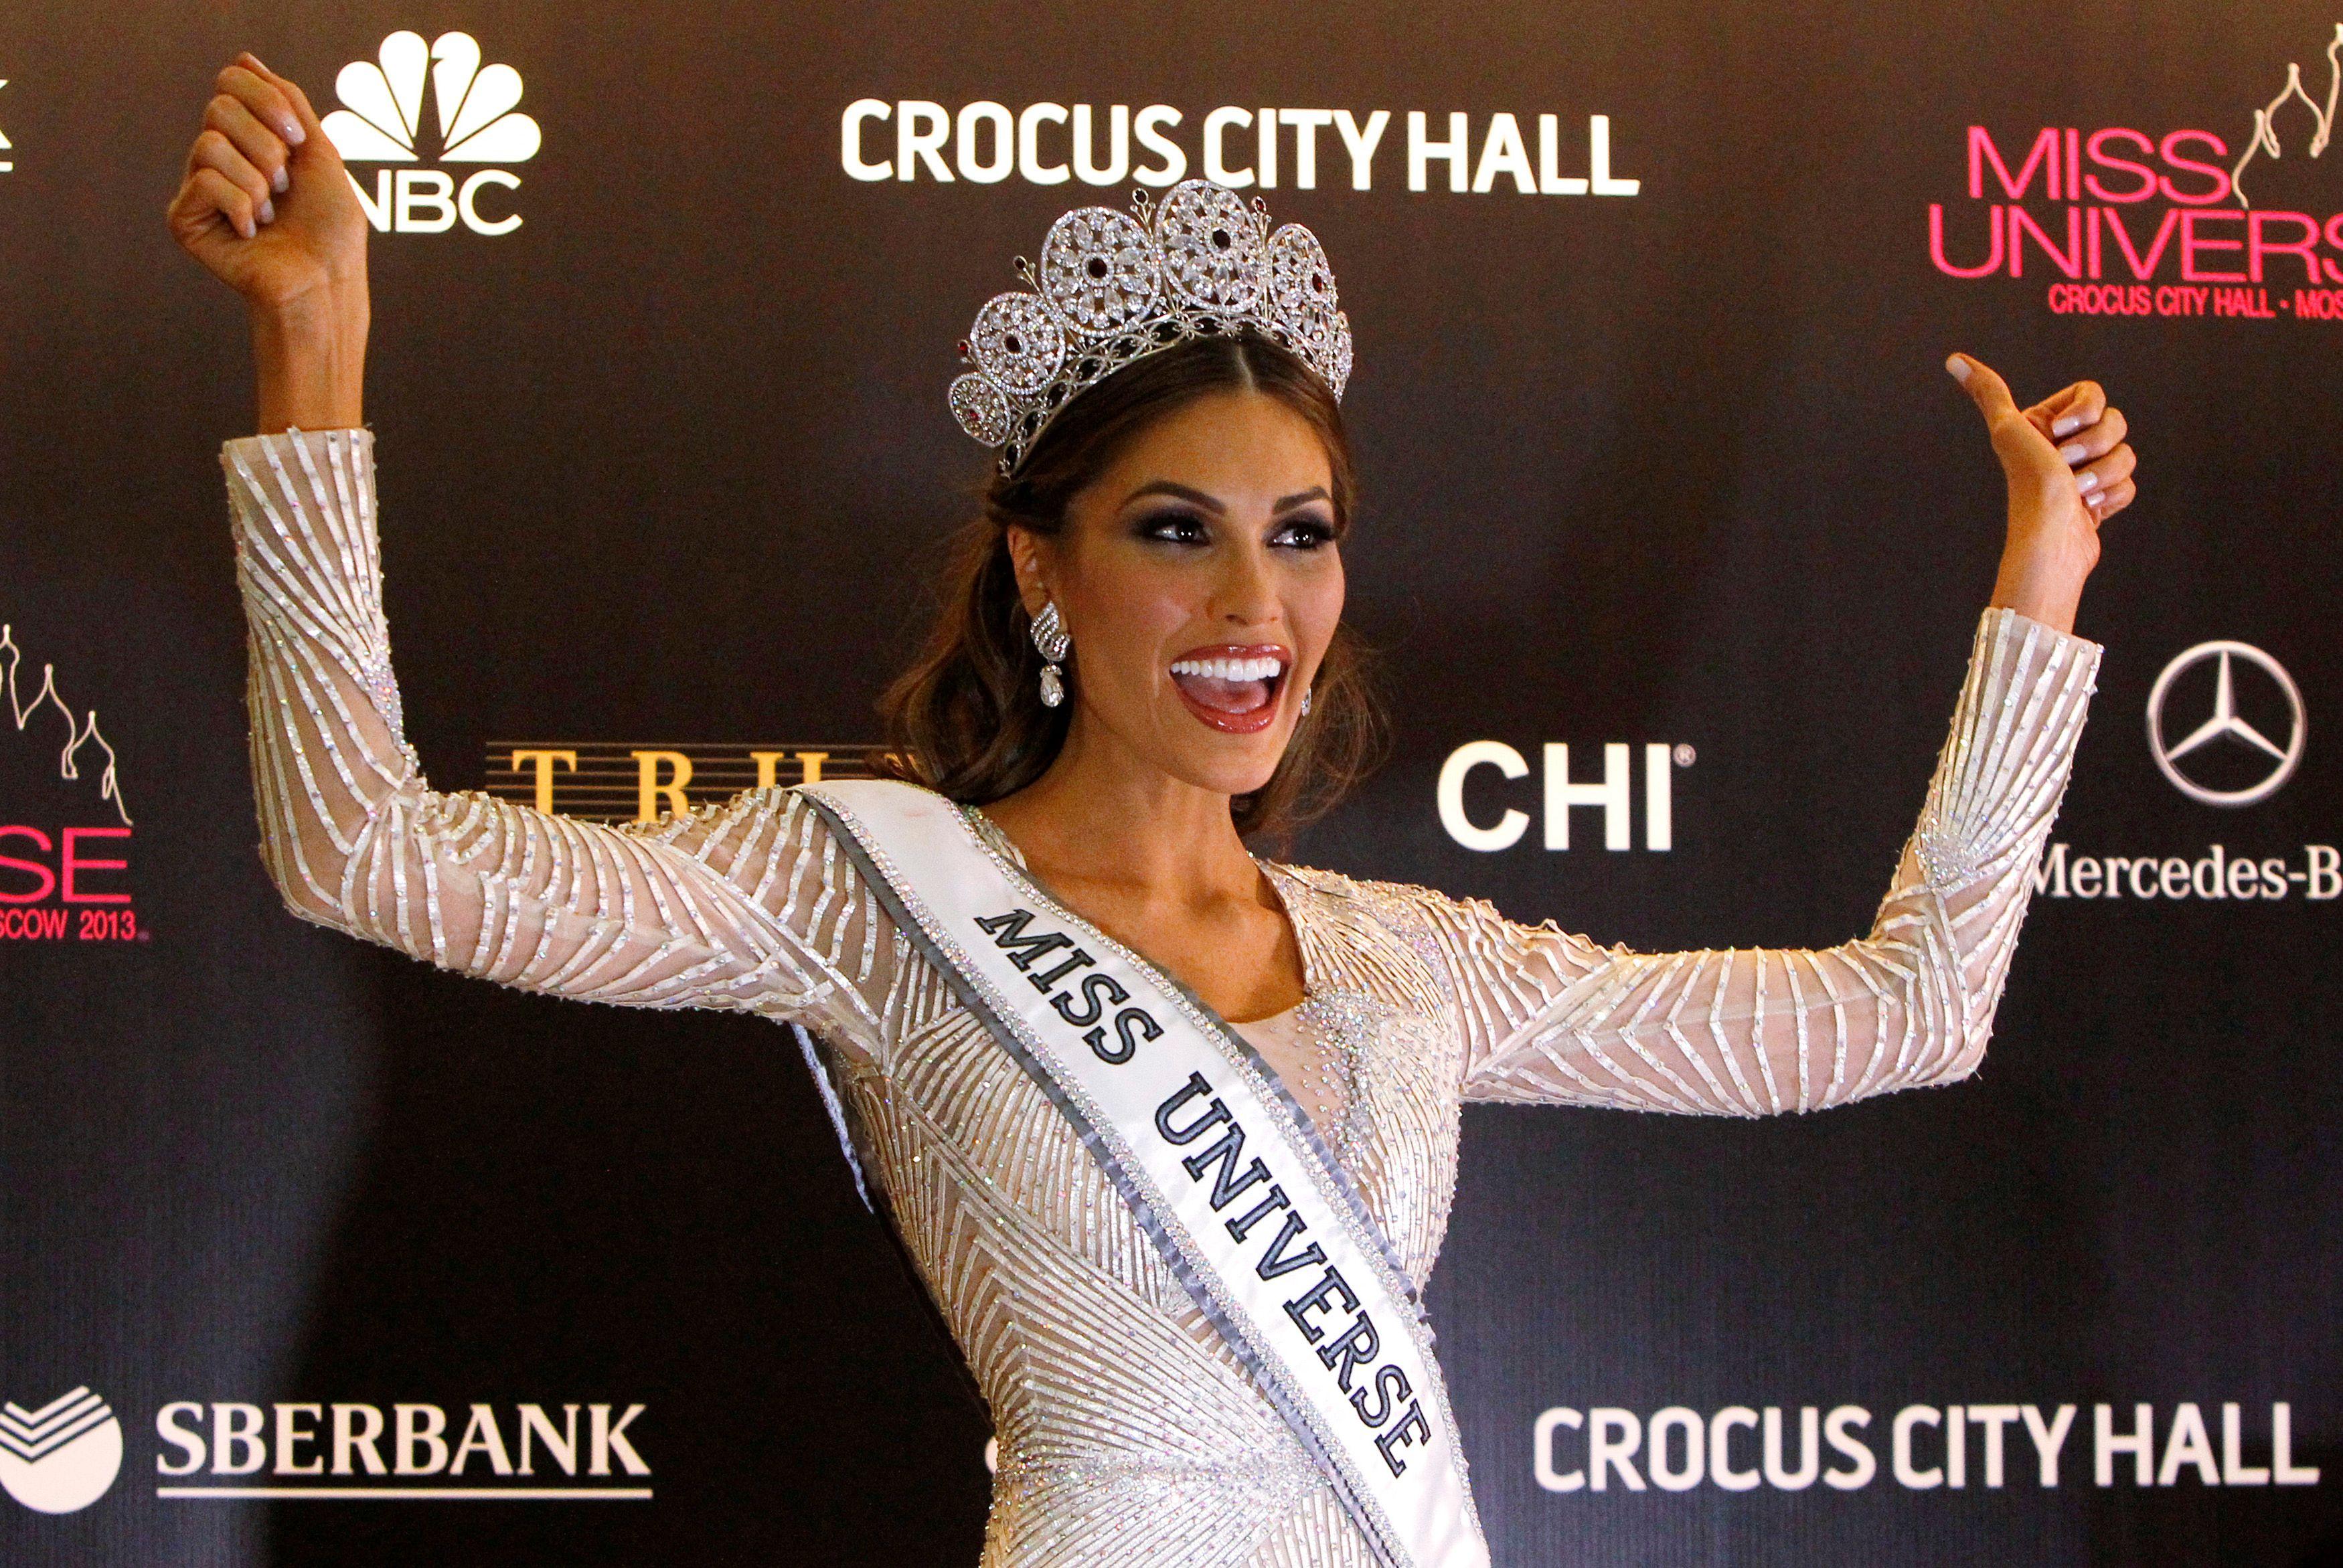 Gabriela Isler, Miss univers 2013.